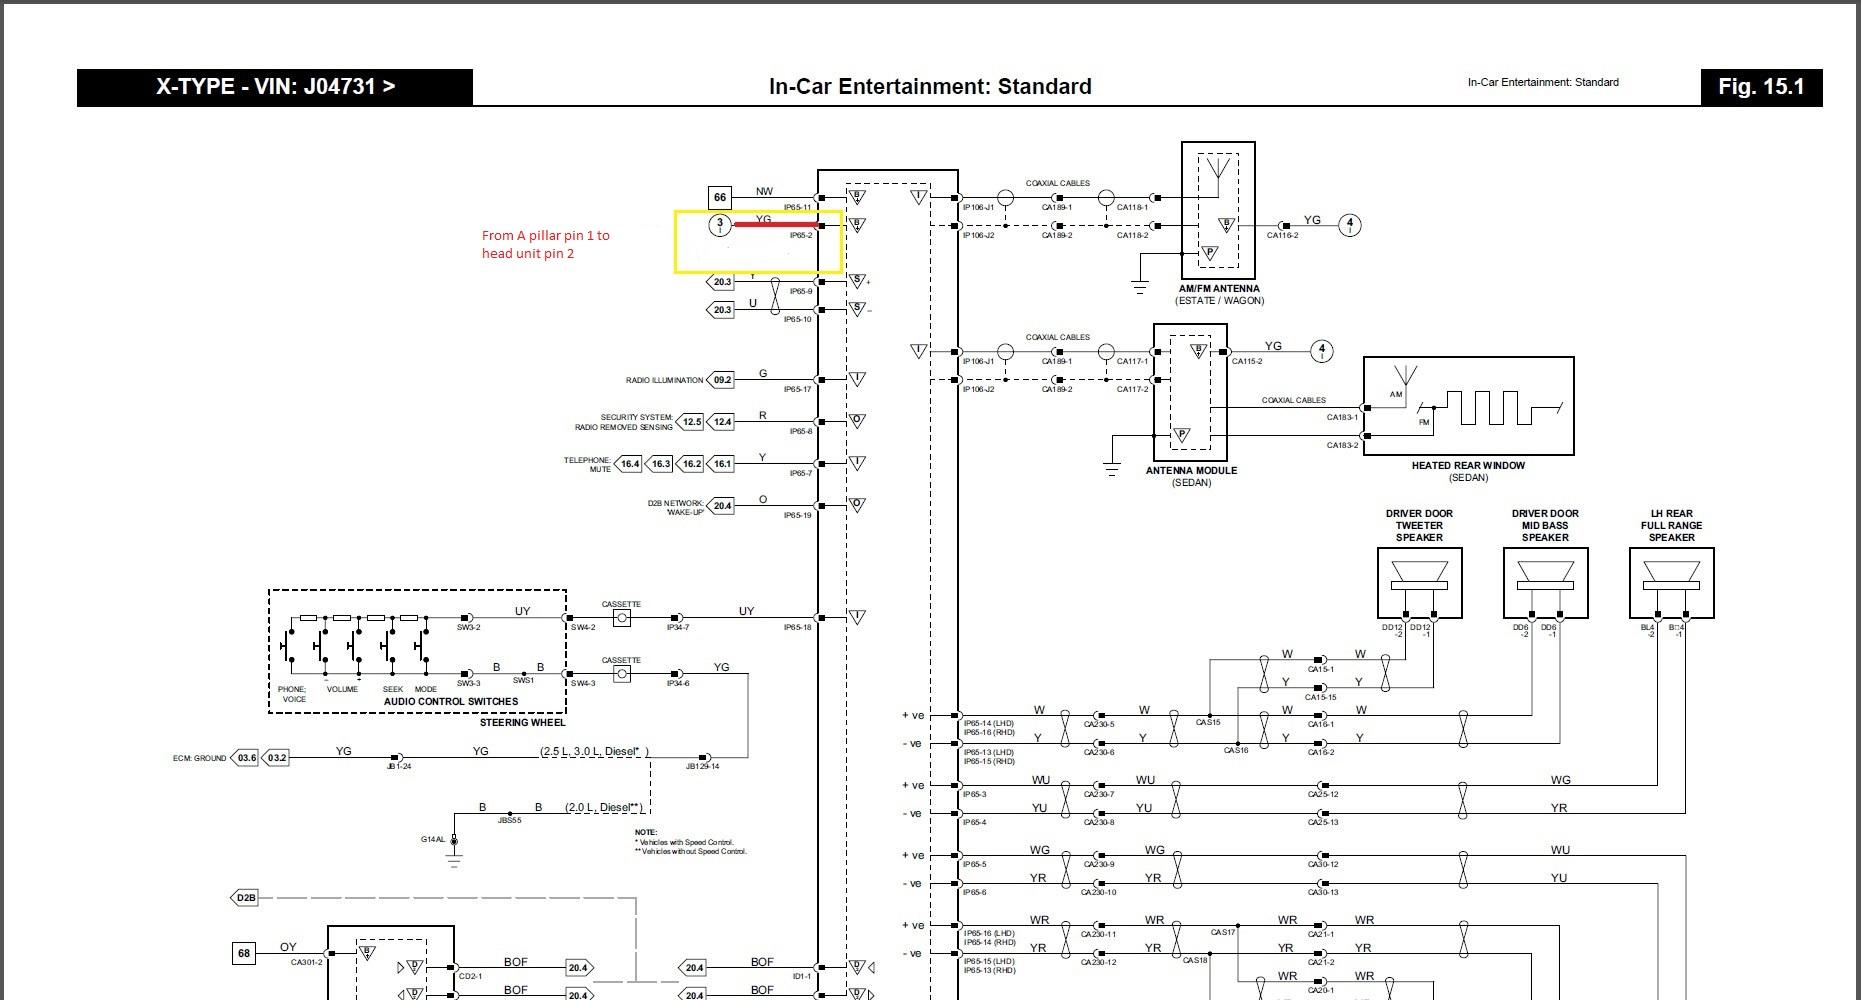 2003 jaguar s type wiring diagram mouse skeletal headlight library